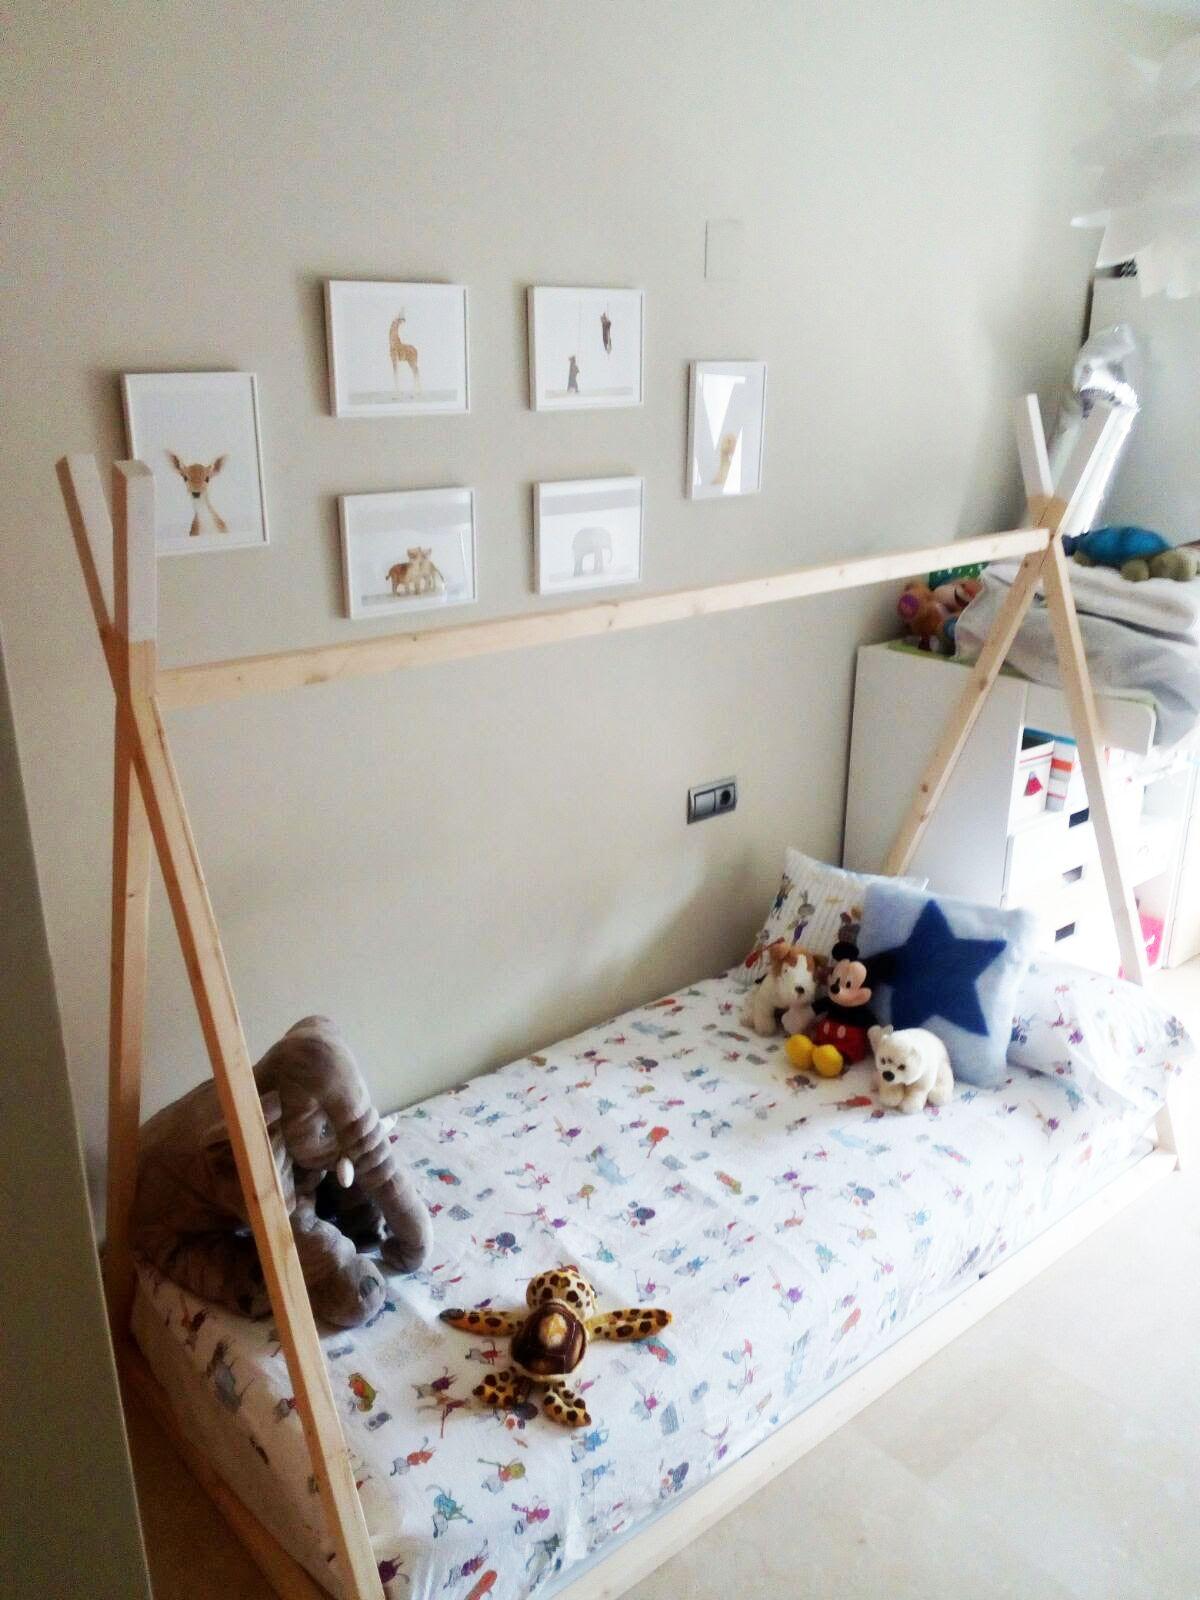 Kids Teepee Wood House Bed Toddler Bed House Montessori: Cama Tipi #montessori #camas #camatipi #teepee #tipi